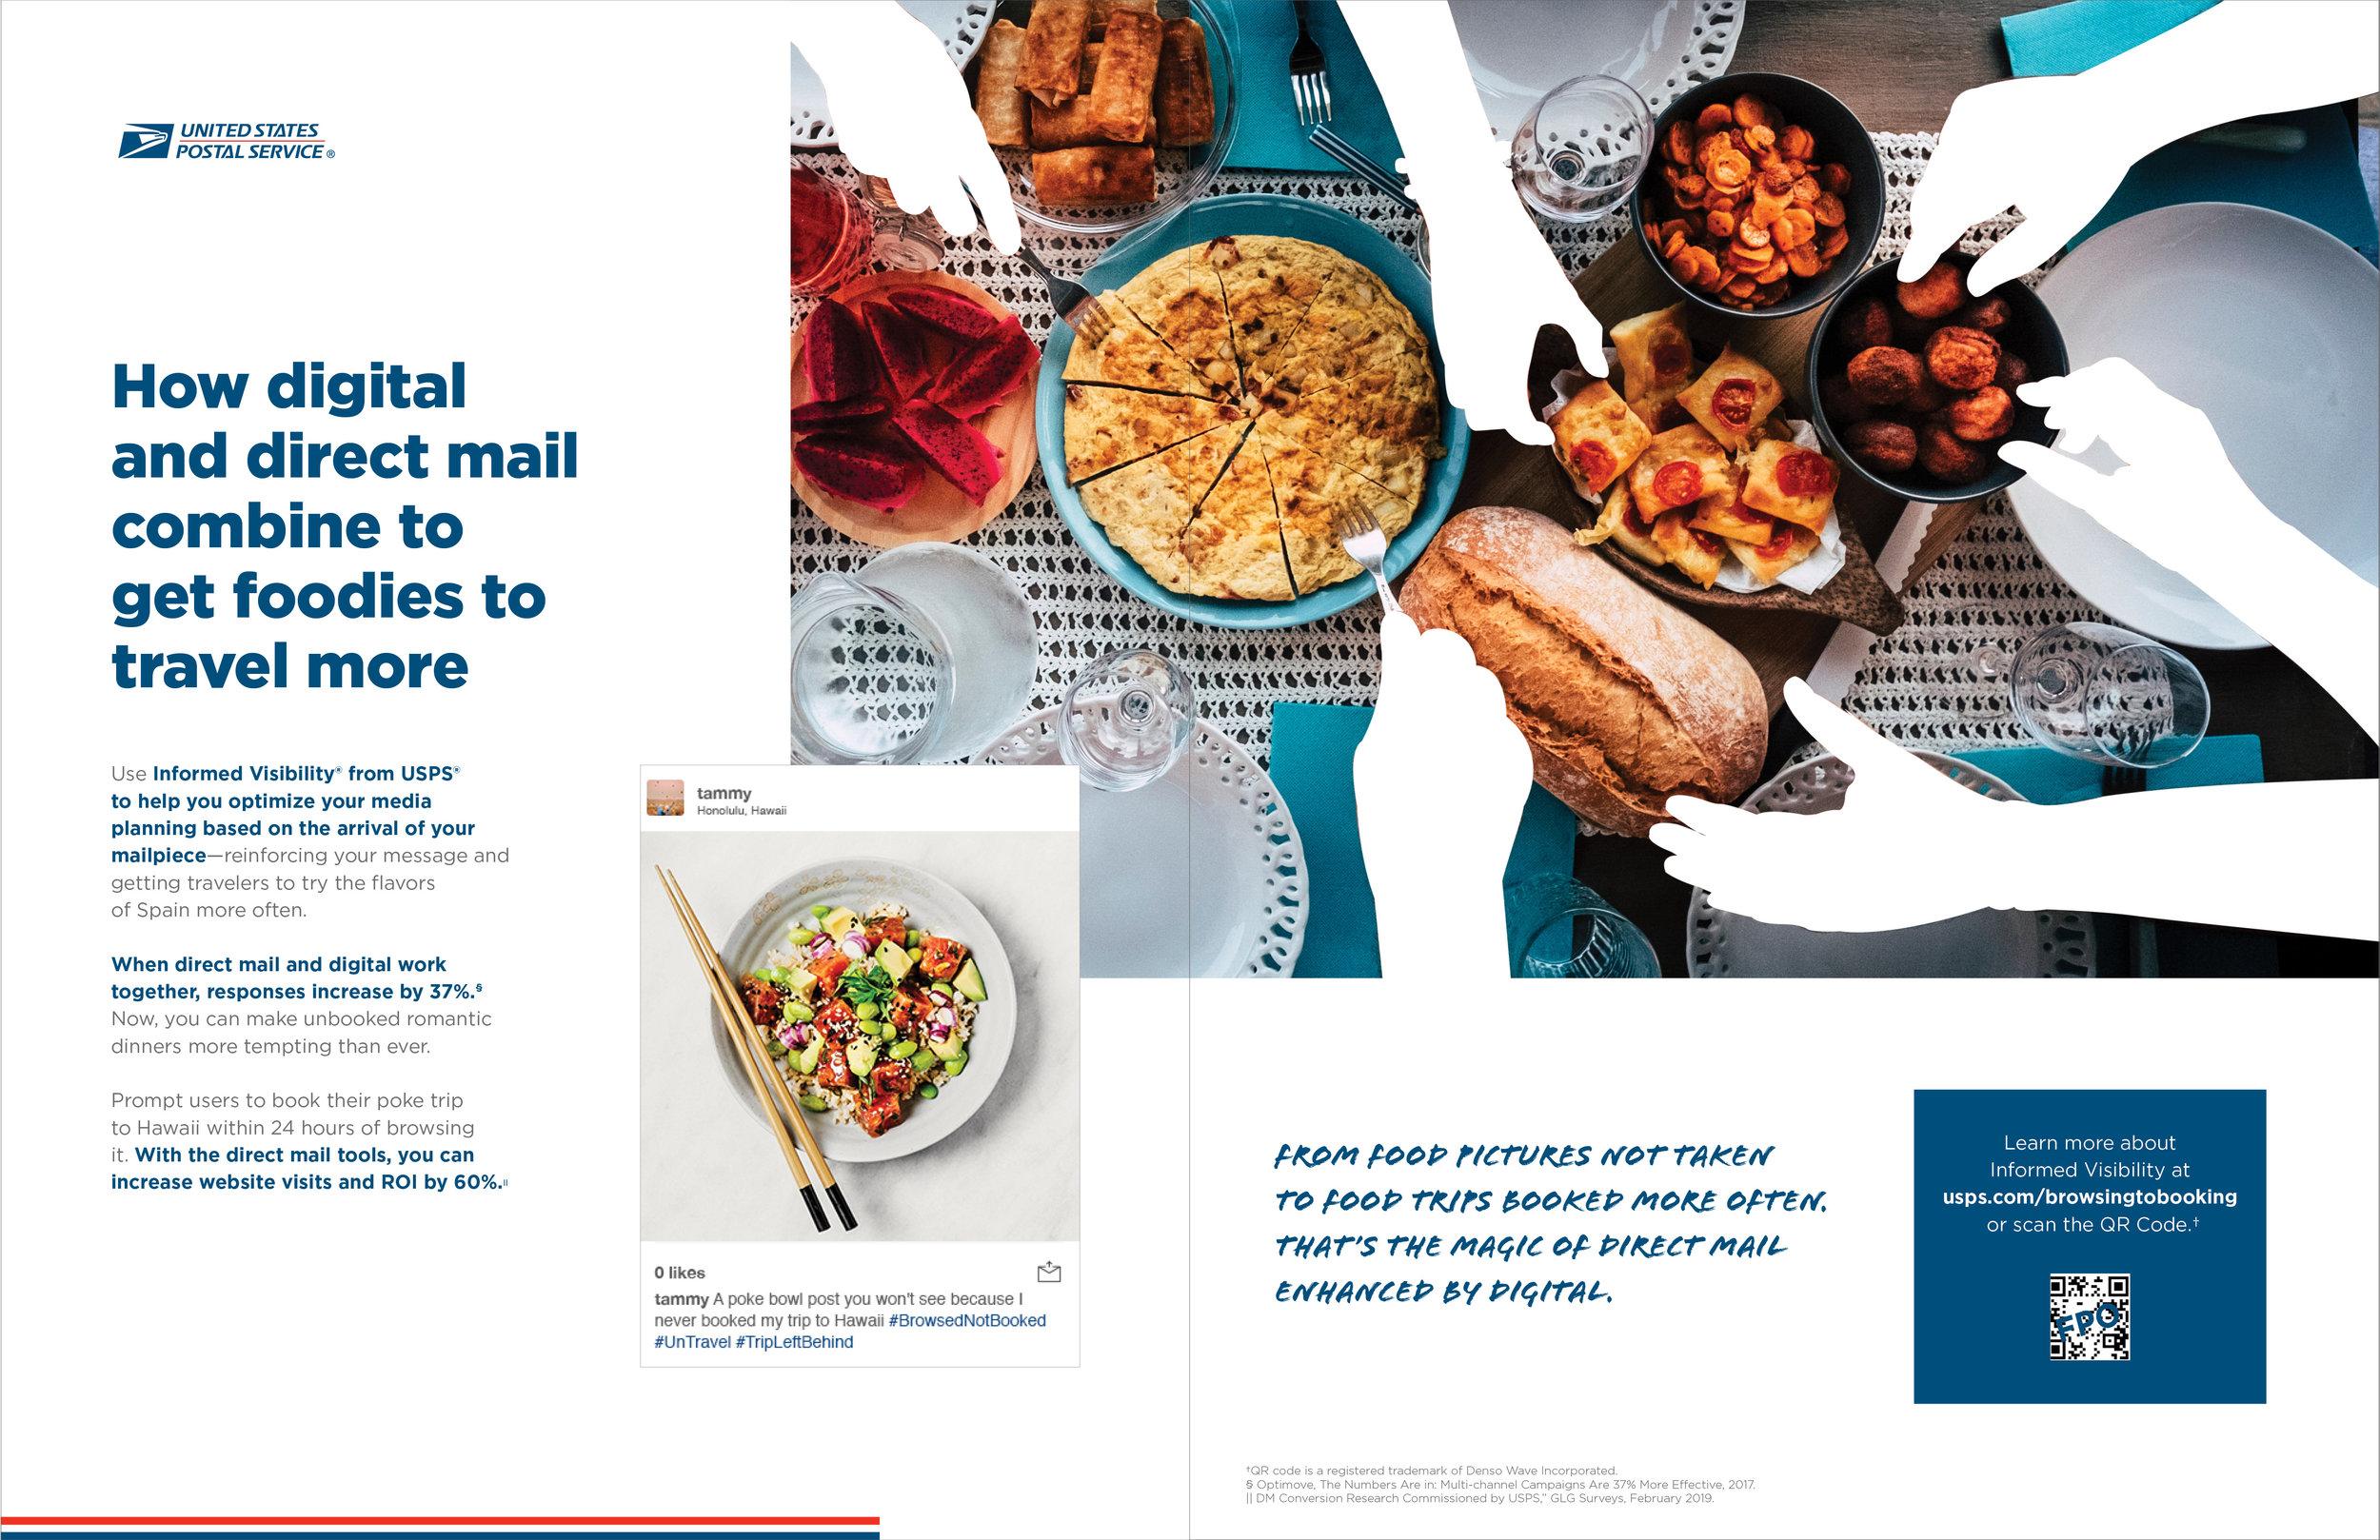 USPS_Seasonal Cycles_Magazine_Folder4.jpg